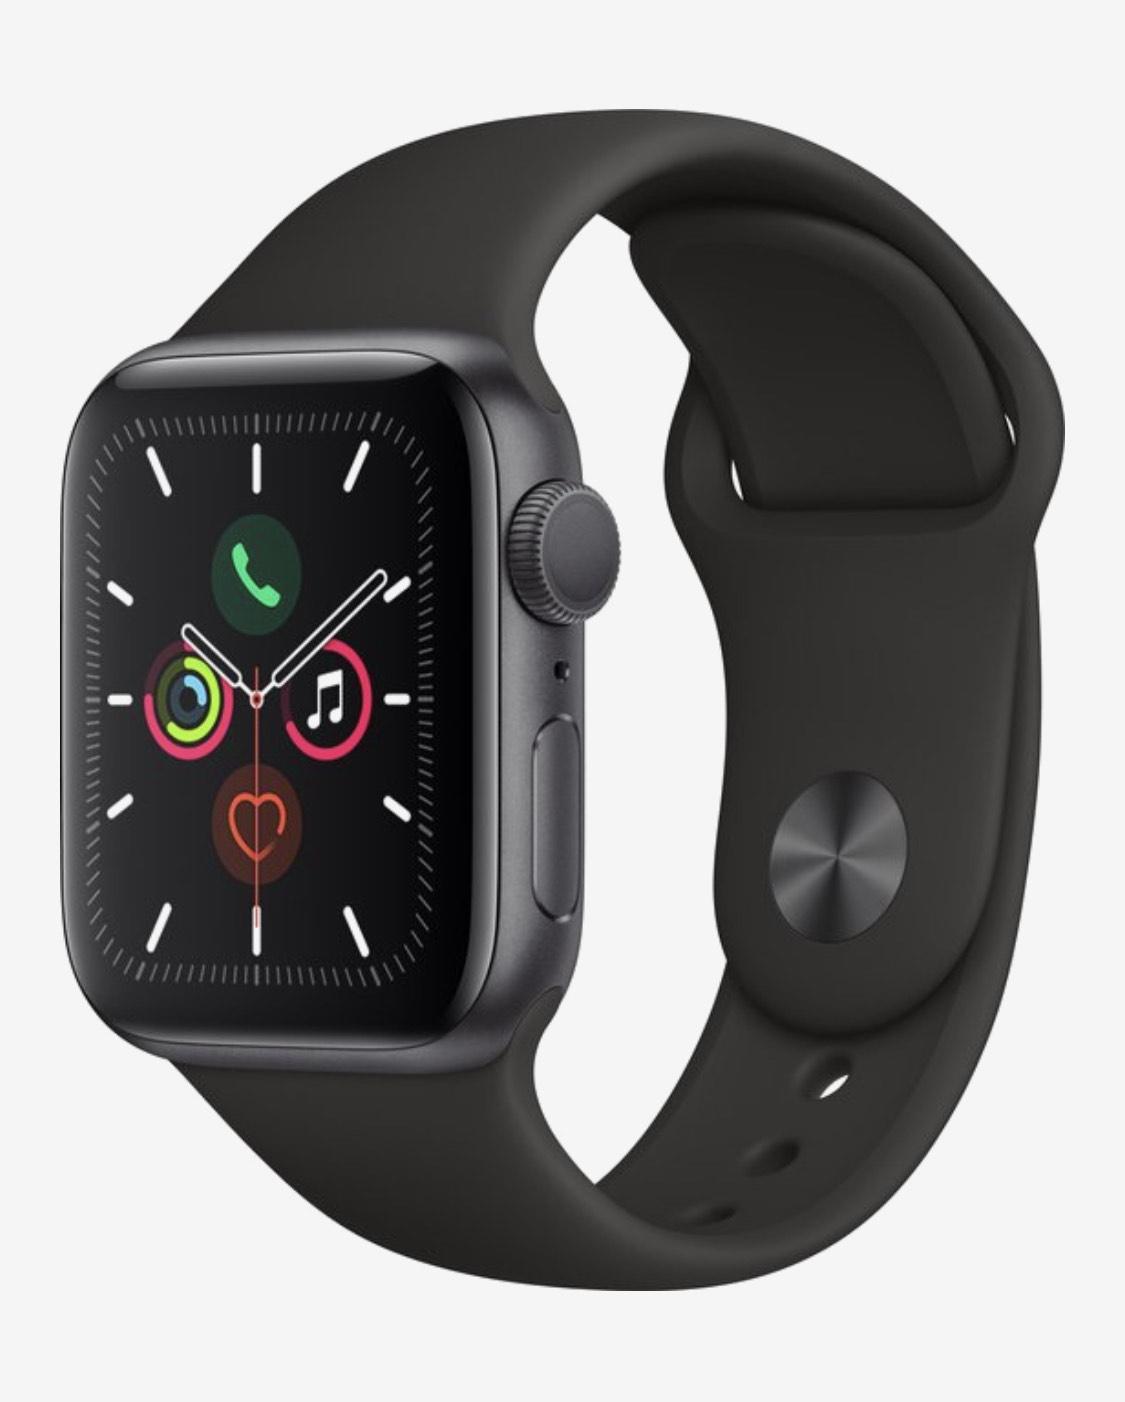 [Grensdeal] Apple Watch Series 5 44 mm